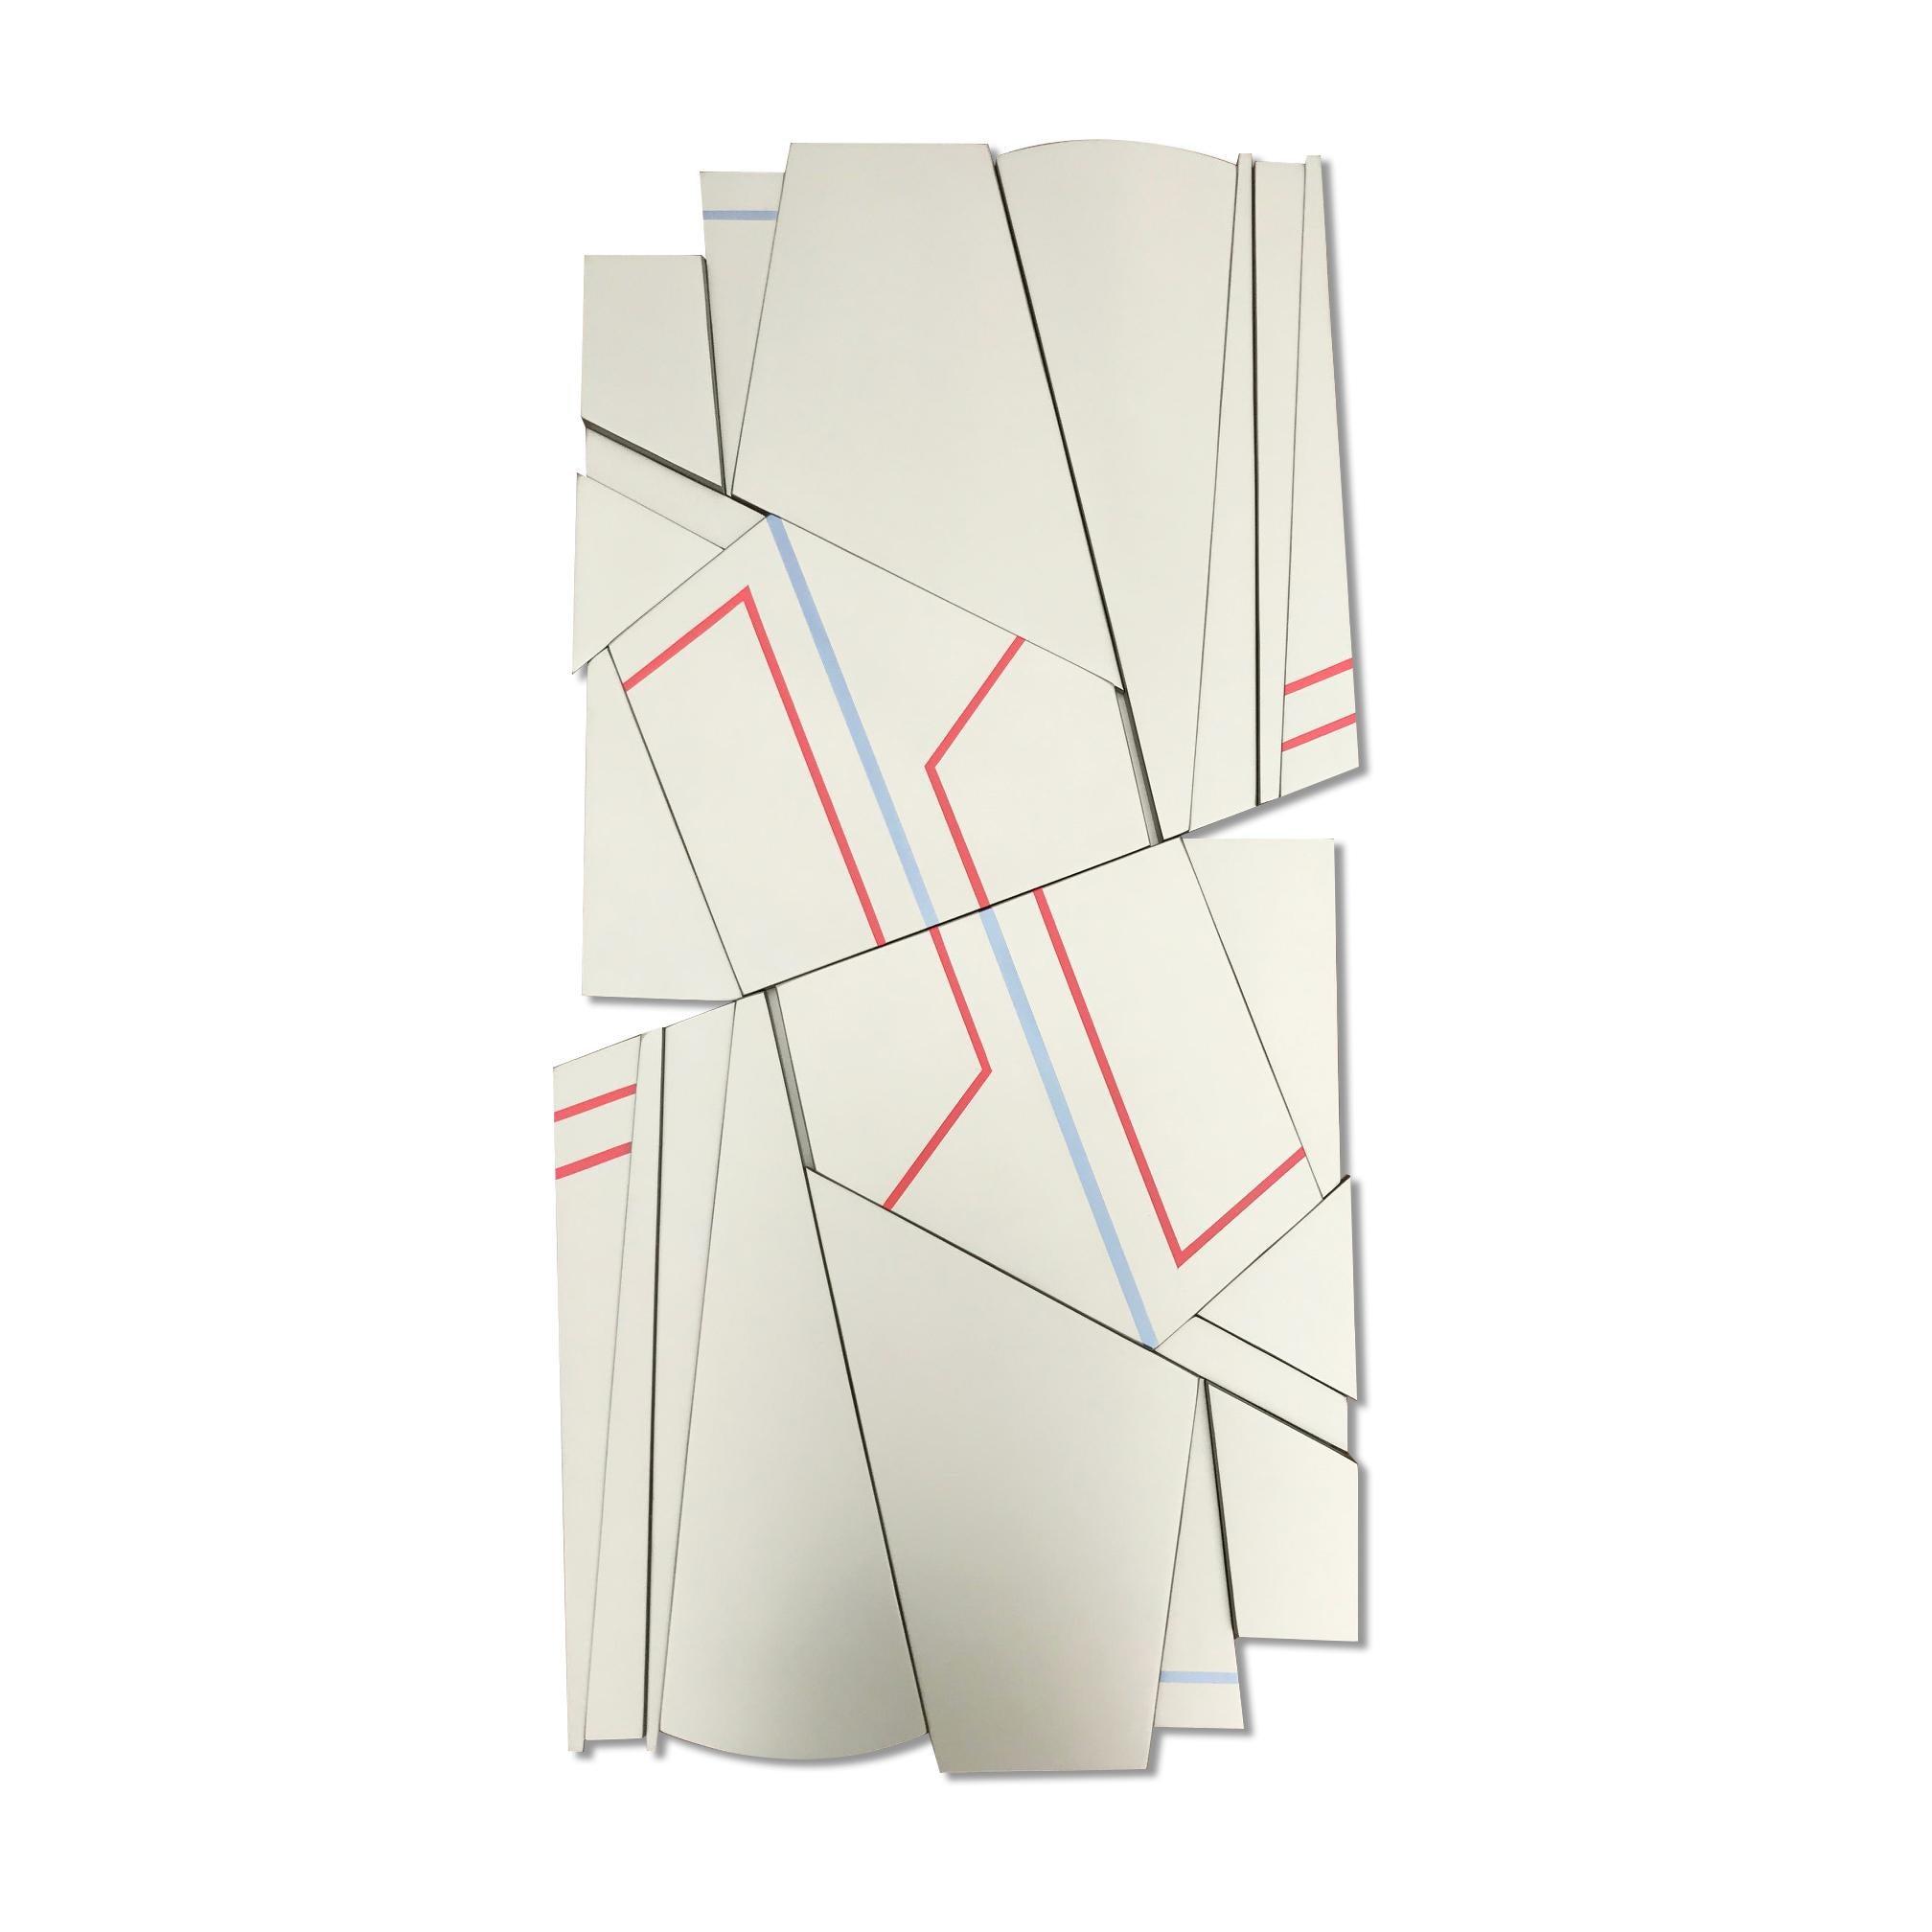 Tonka 1 (wood Art Deco wall sculpture minimal geometric modern ivory cream